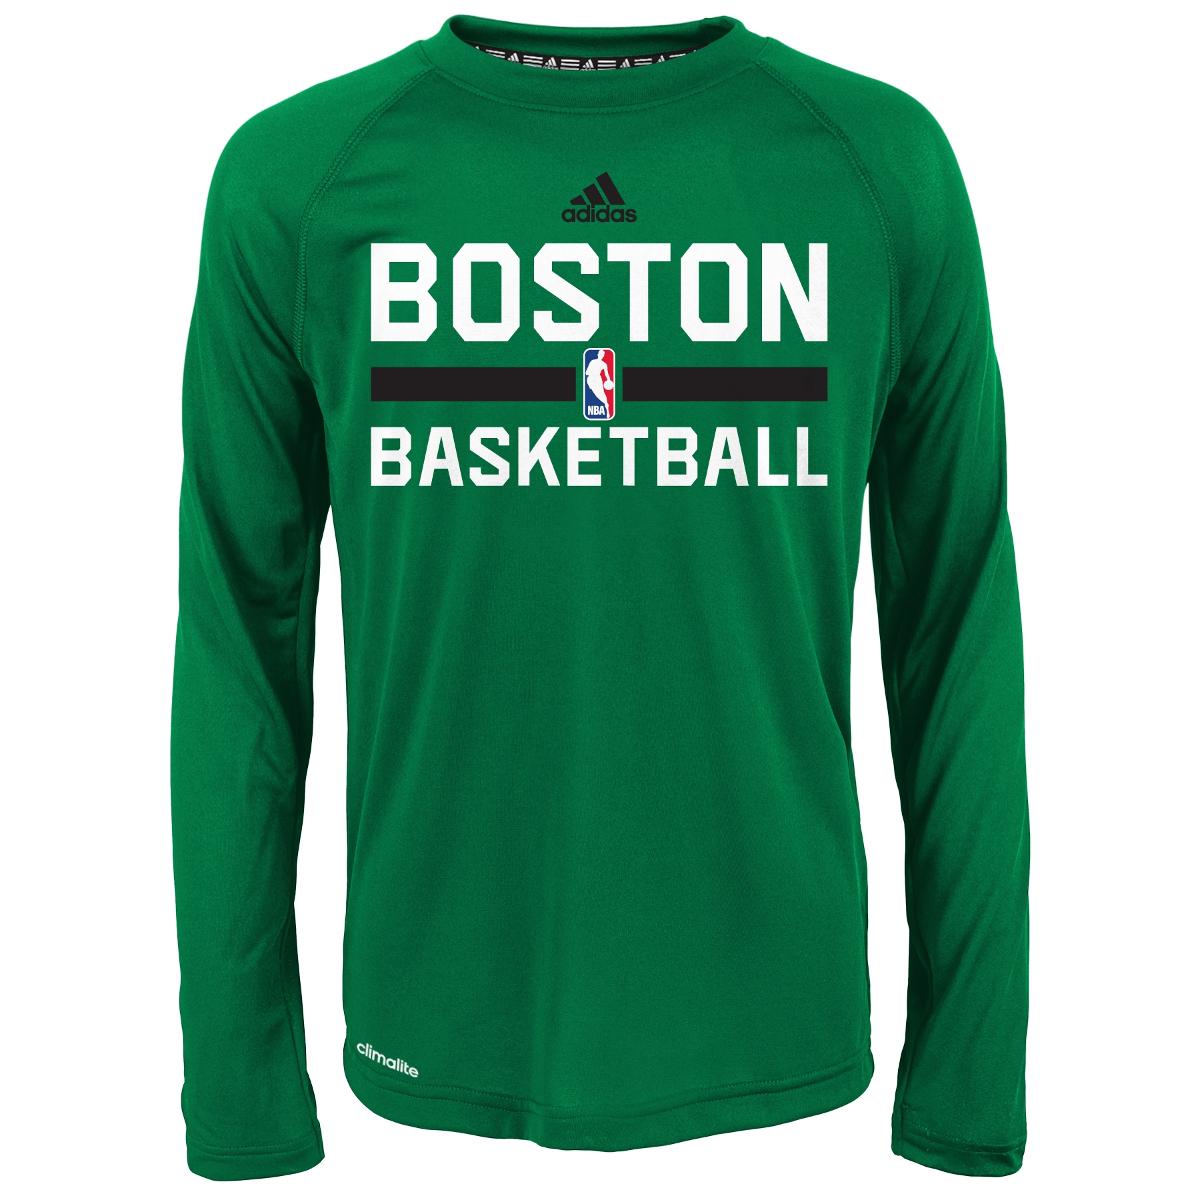 detailed look b0290 1be17 BOSTON CELTICS Boys' Practice Wear Long-Sleeve Tee - Bob's ...